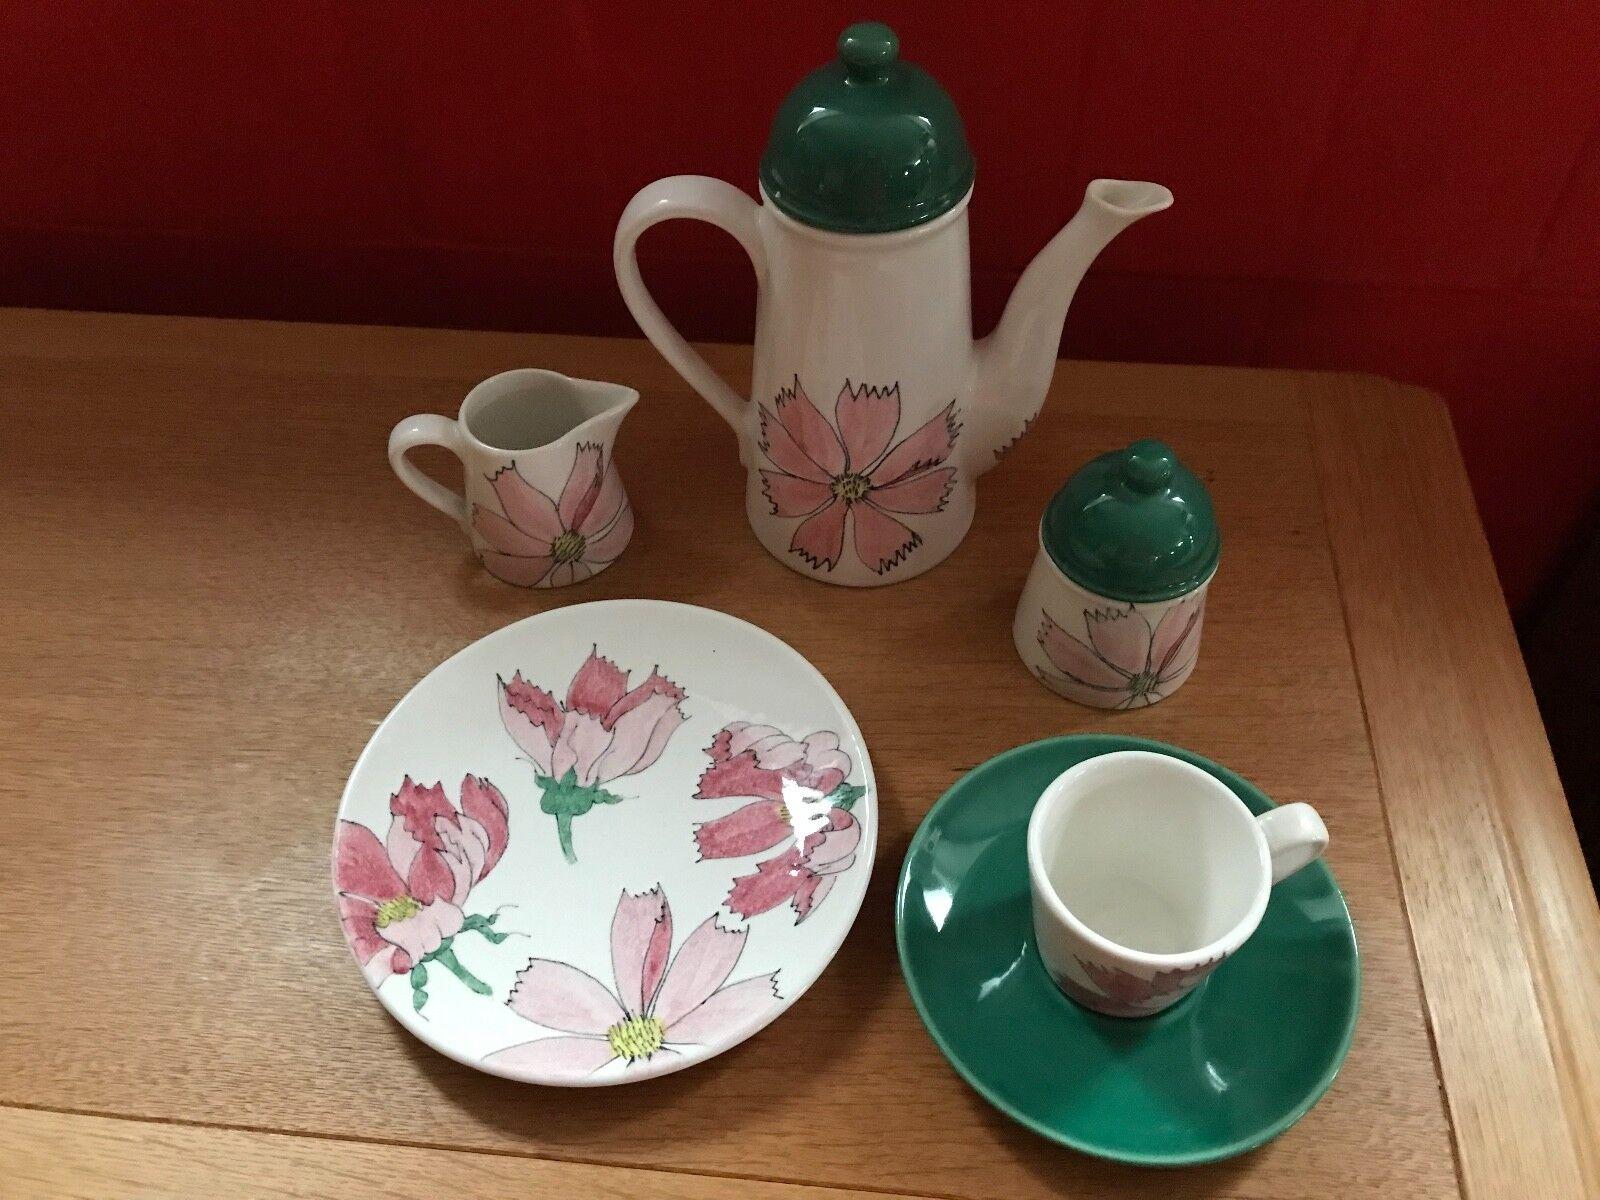 Italienische Keramik Kaffee Set 6 teilig  mit exklusiver Handmalerei  ️ ️